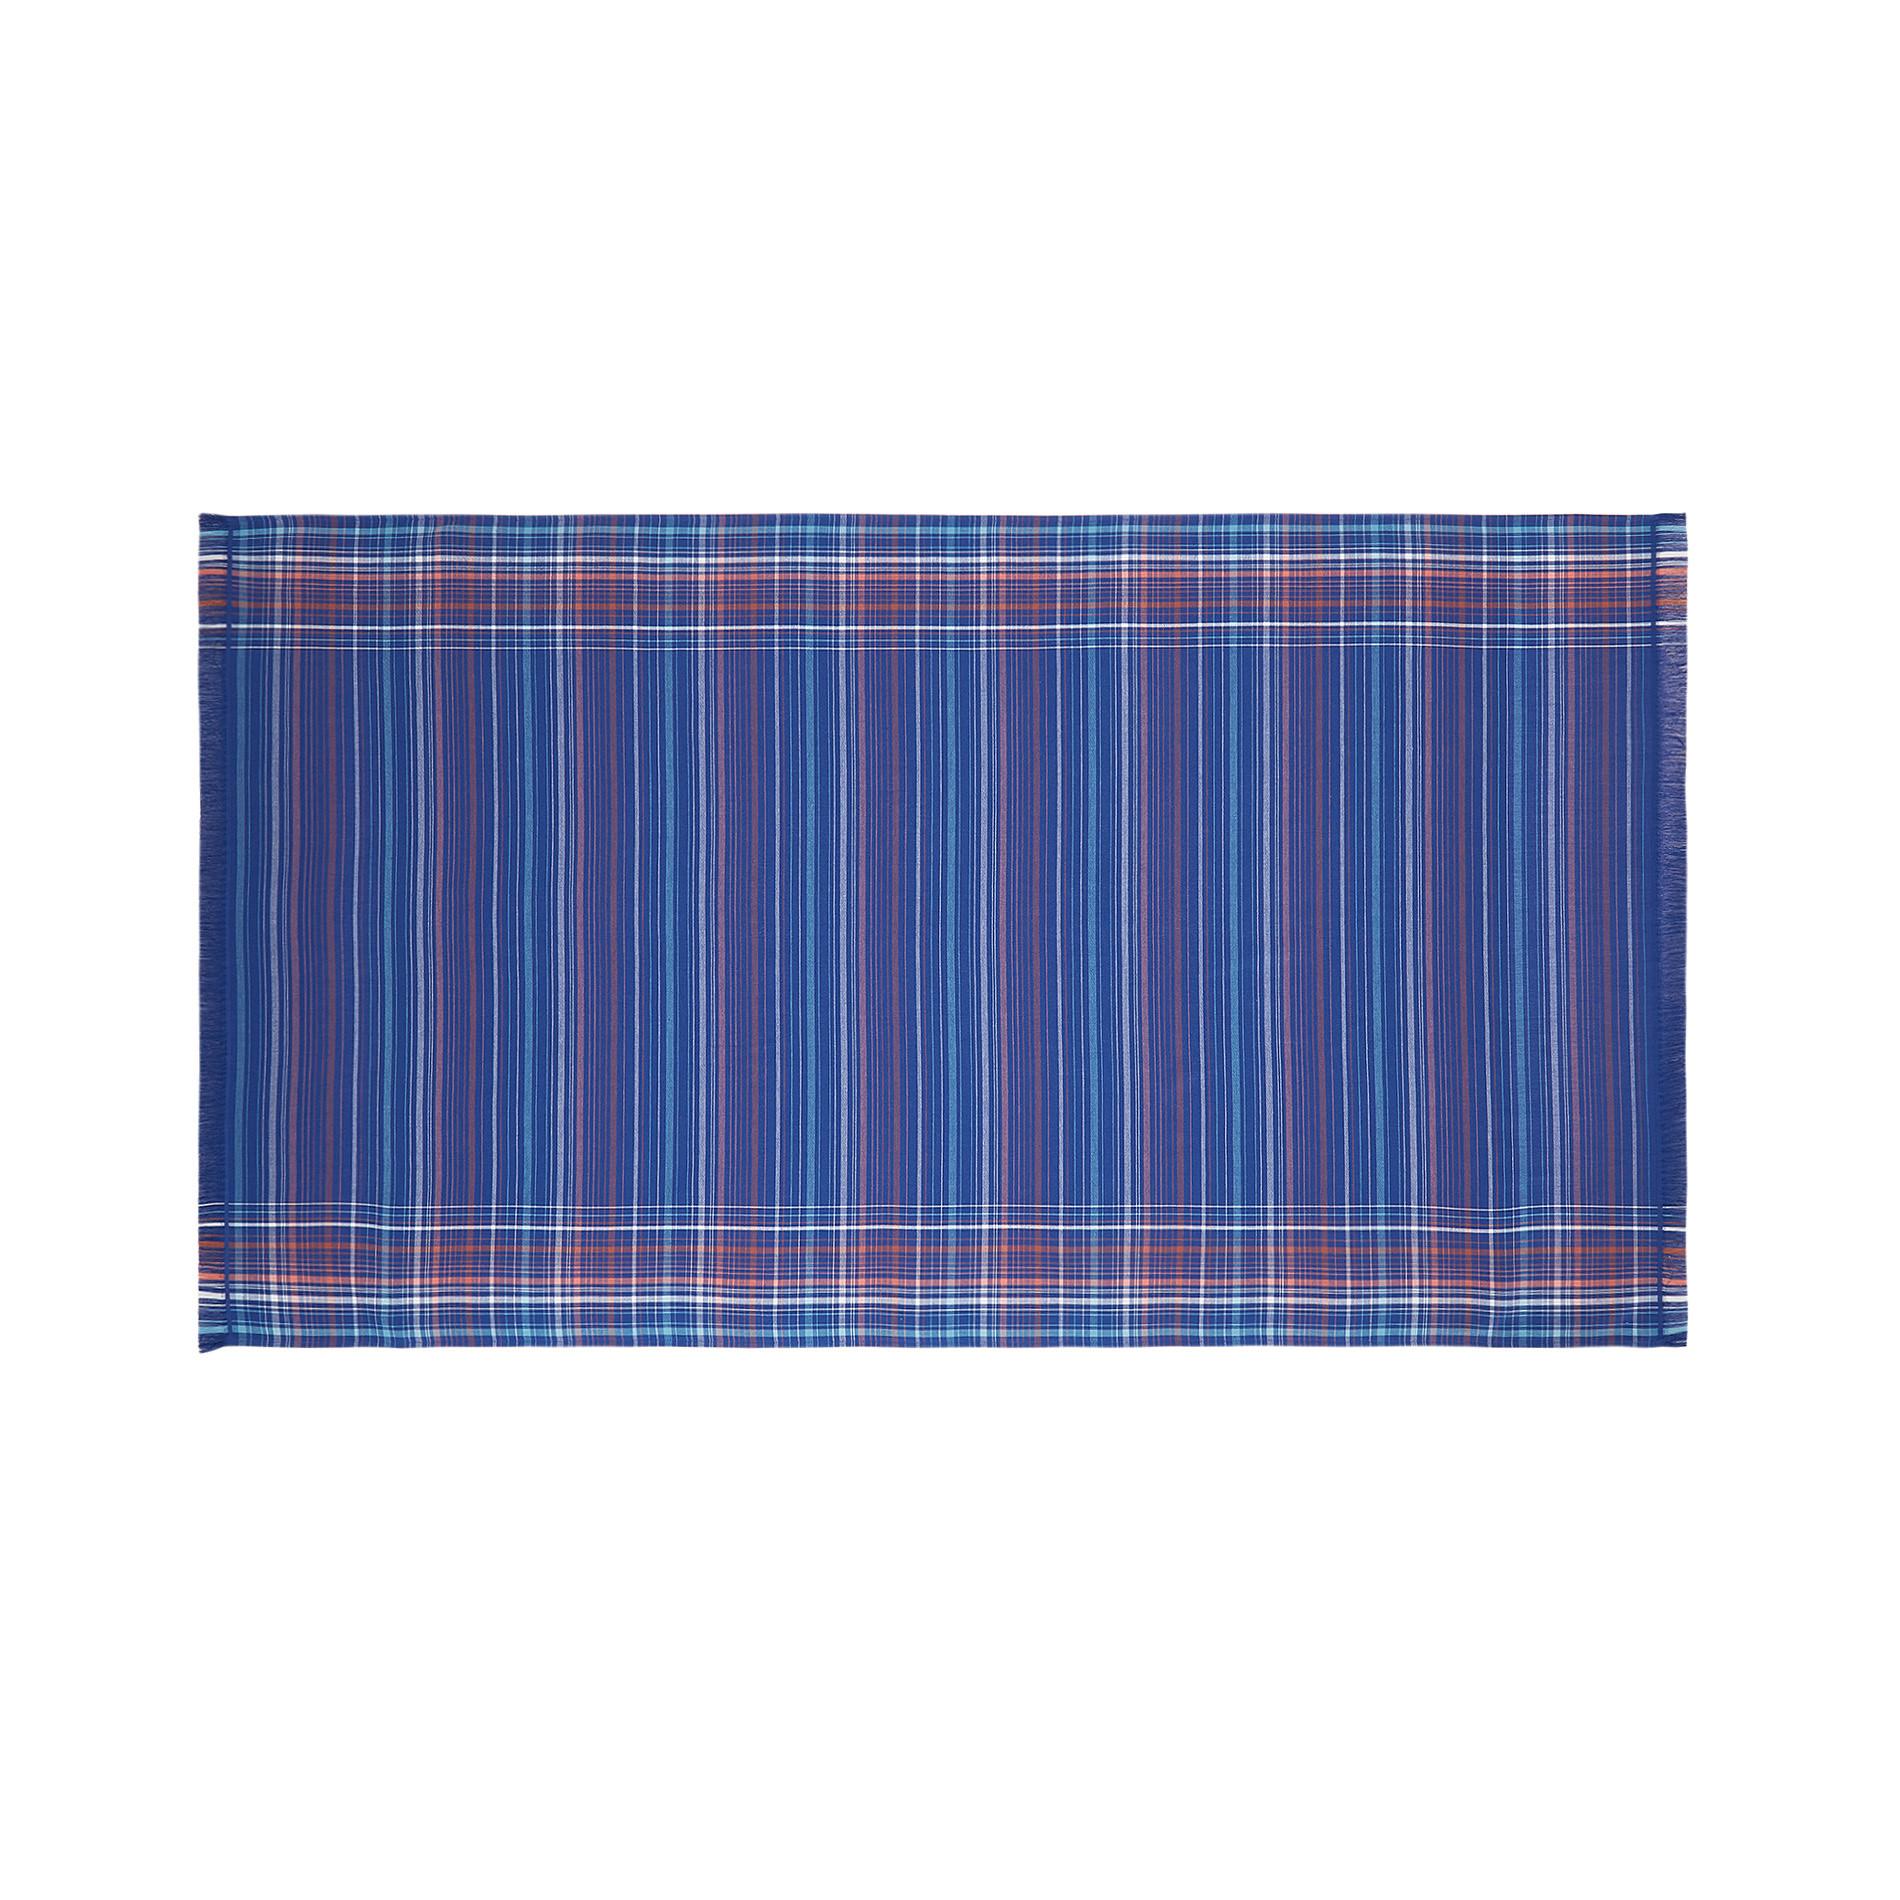 Telo mare hammam cotone tinto filo a righe, Blu, large image number 0